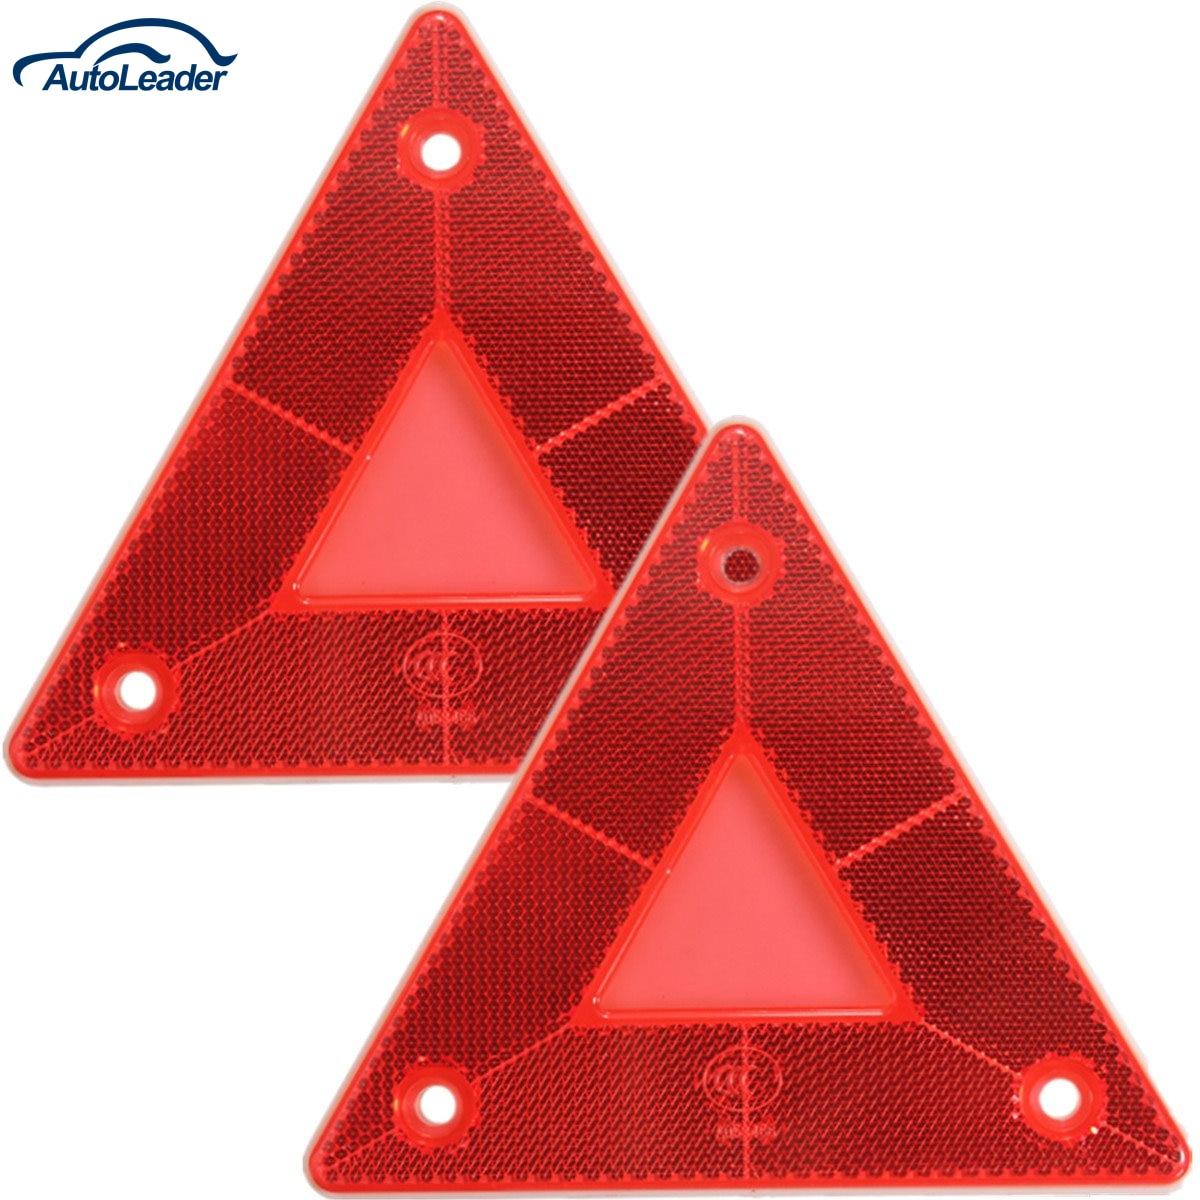 2Pcs Rear <font><b>Light</b></font> Car <font><b>Truck</b></font> Trailer Fire Triangle Reflector Safty Warning Board